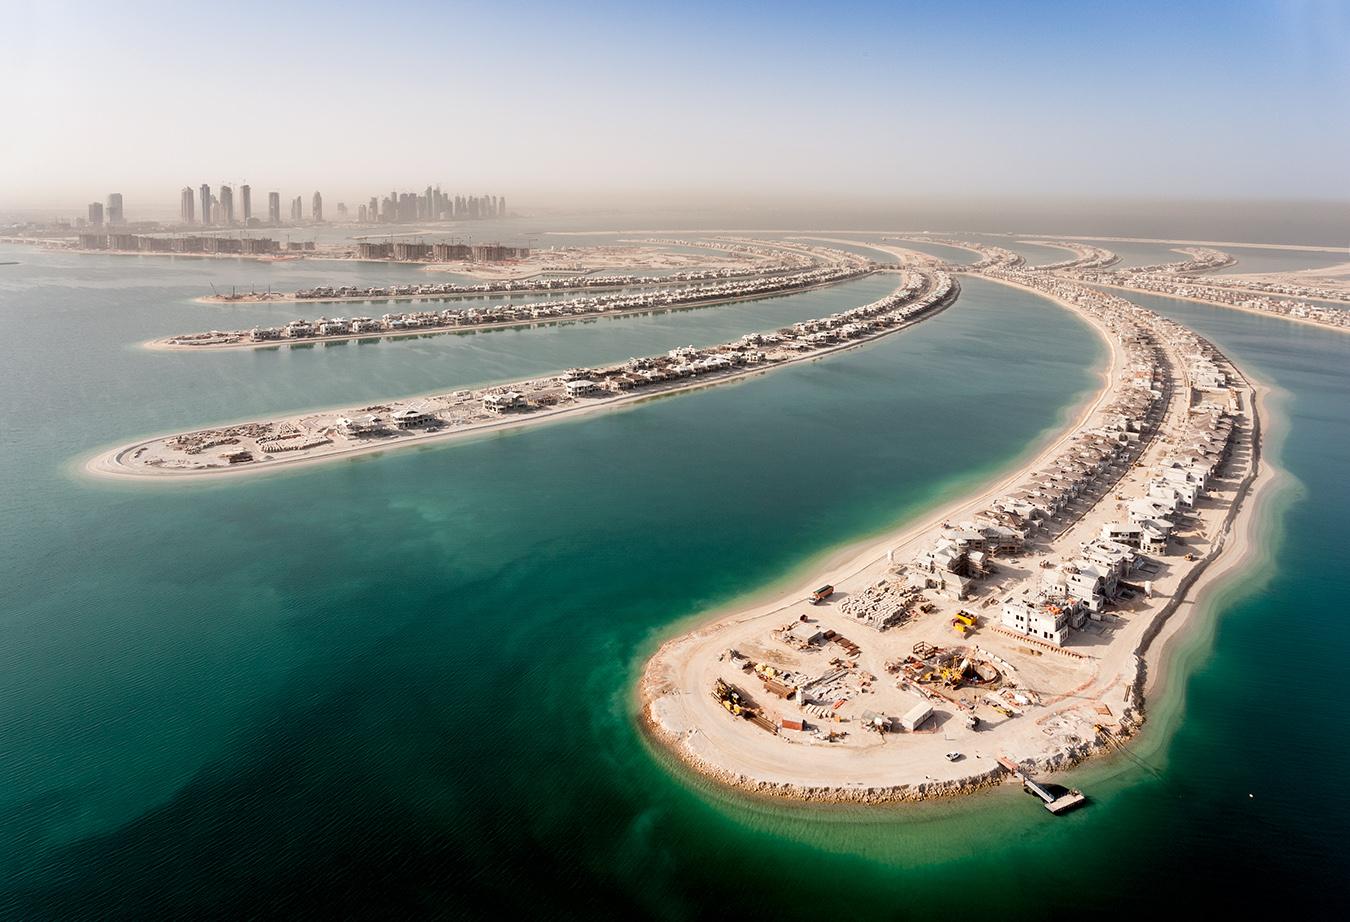 PALM JUMERIAH CONSTRUCTION, DUBAI FOR INSIDE MAGAZINE